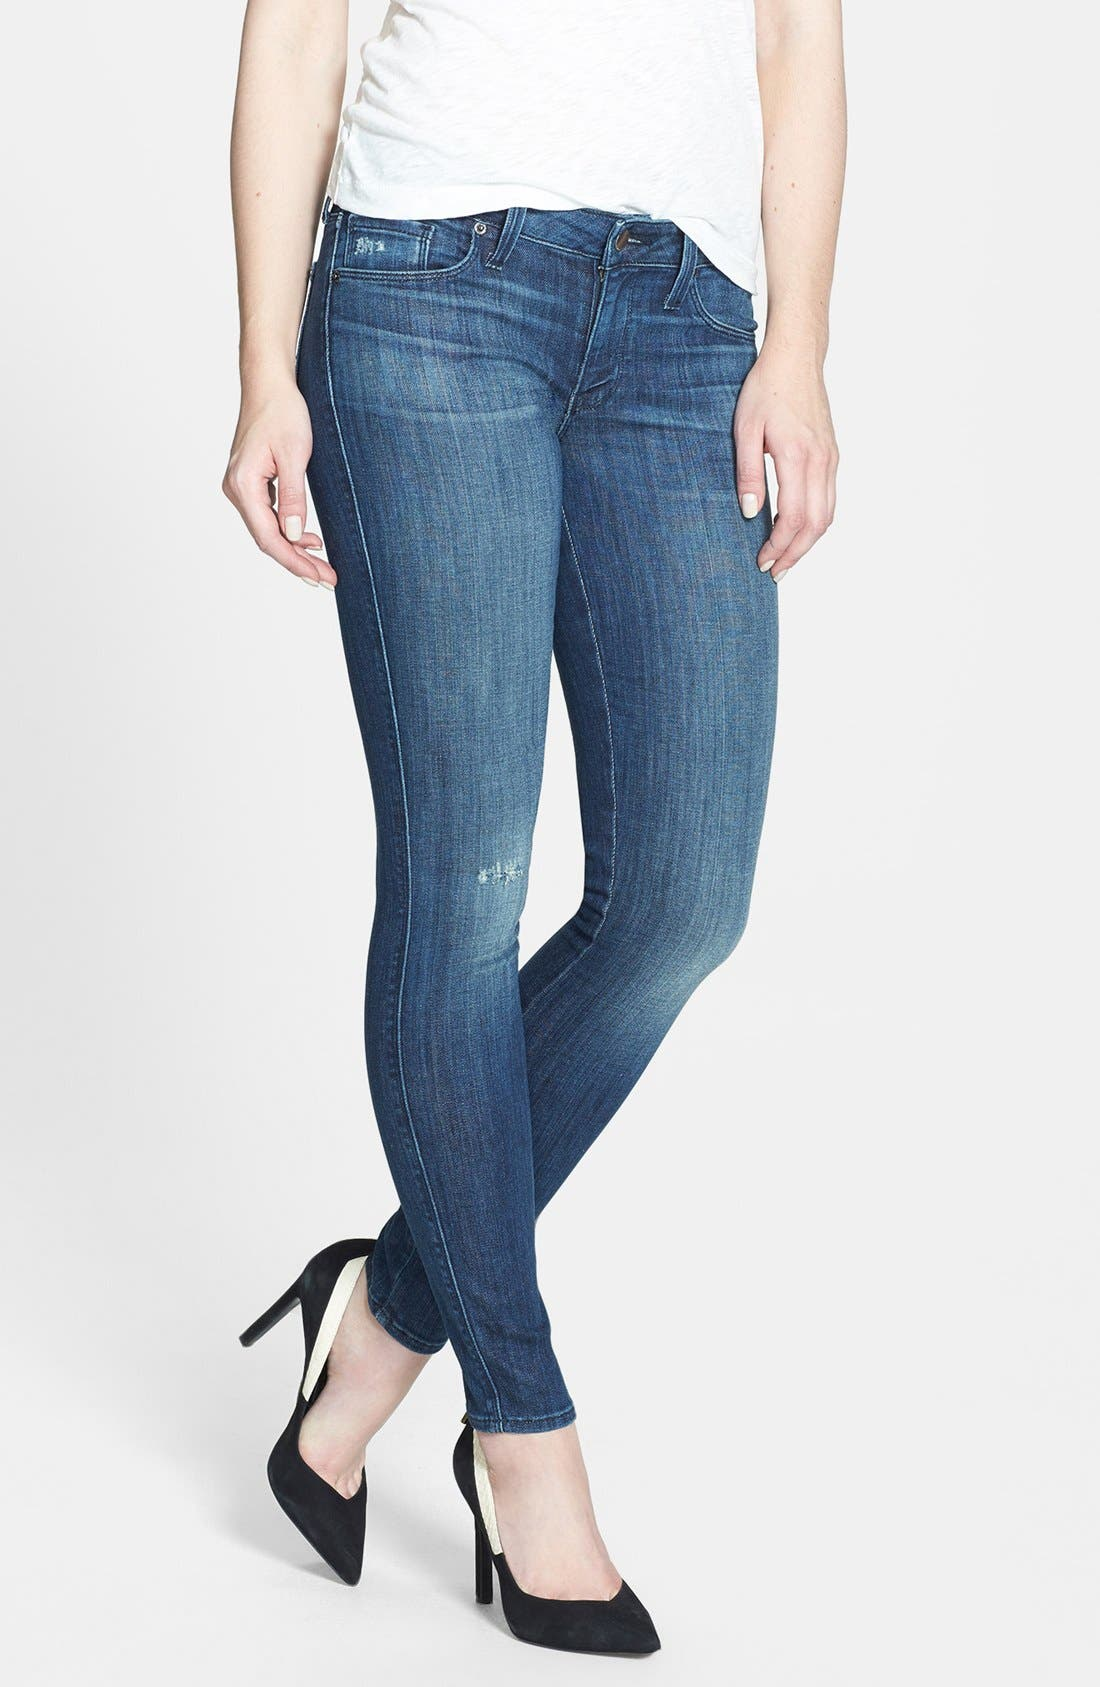 Main Image - Genetic 'Shya' Cigarette Skinny Jeans (Enigma)